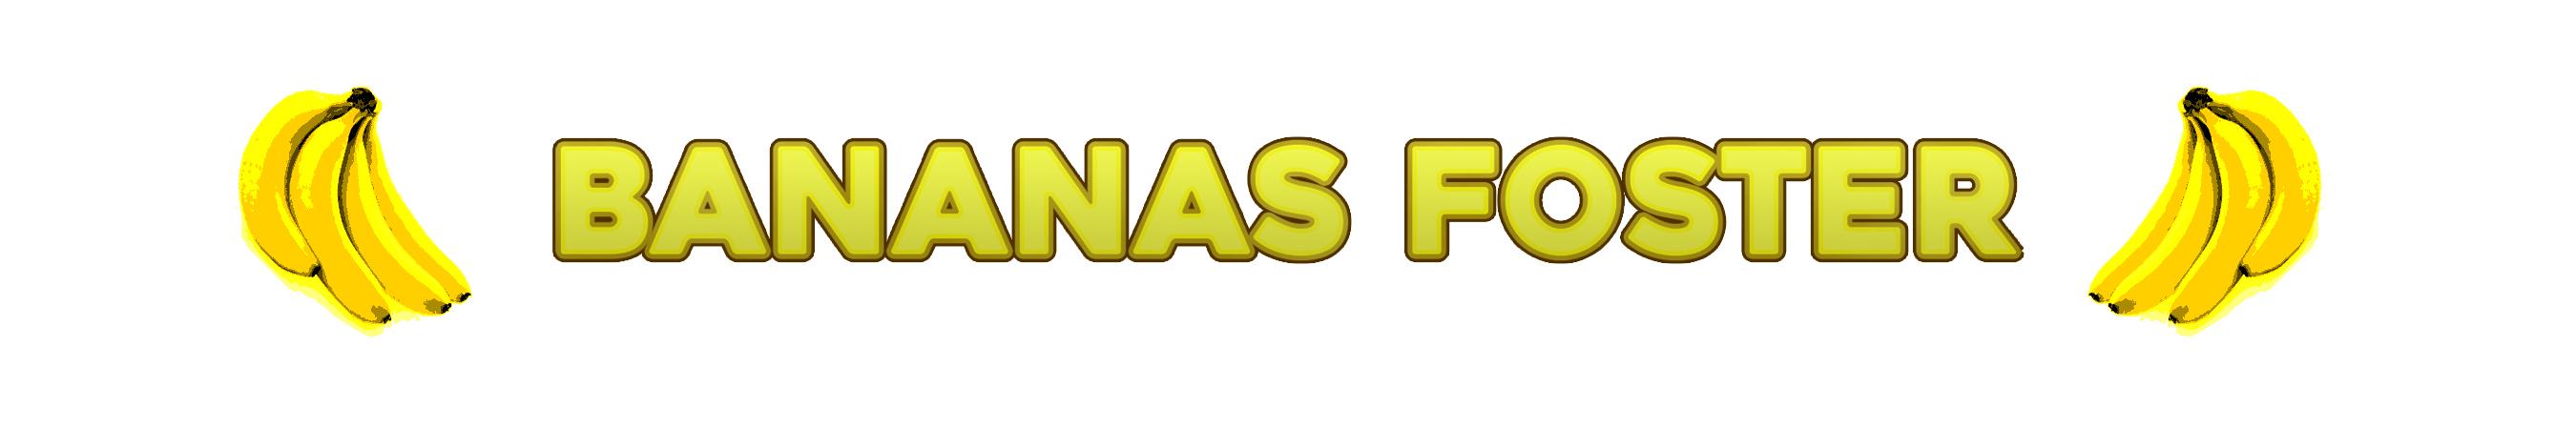 BananasFoster